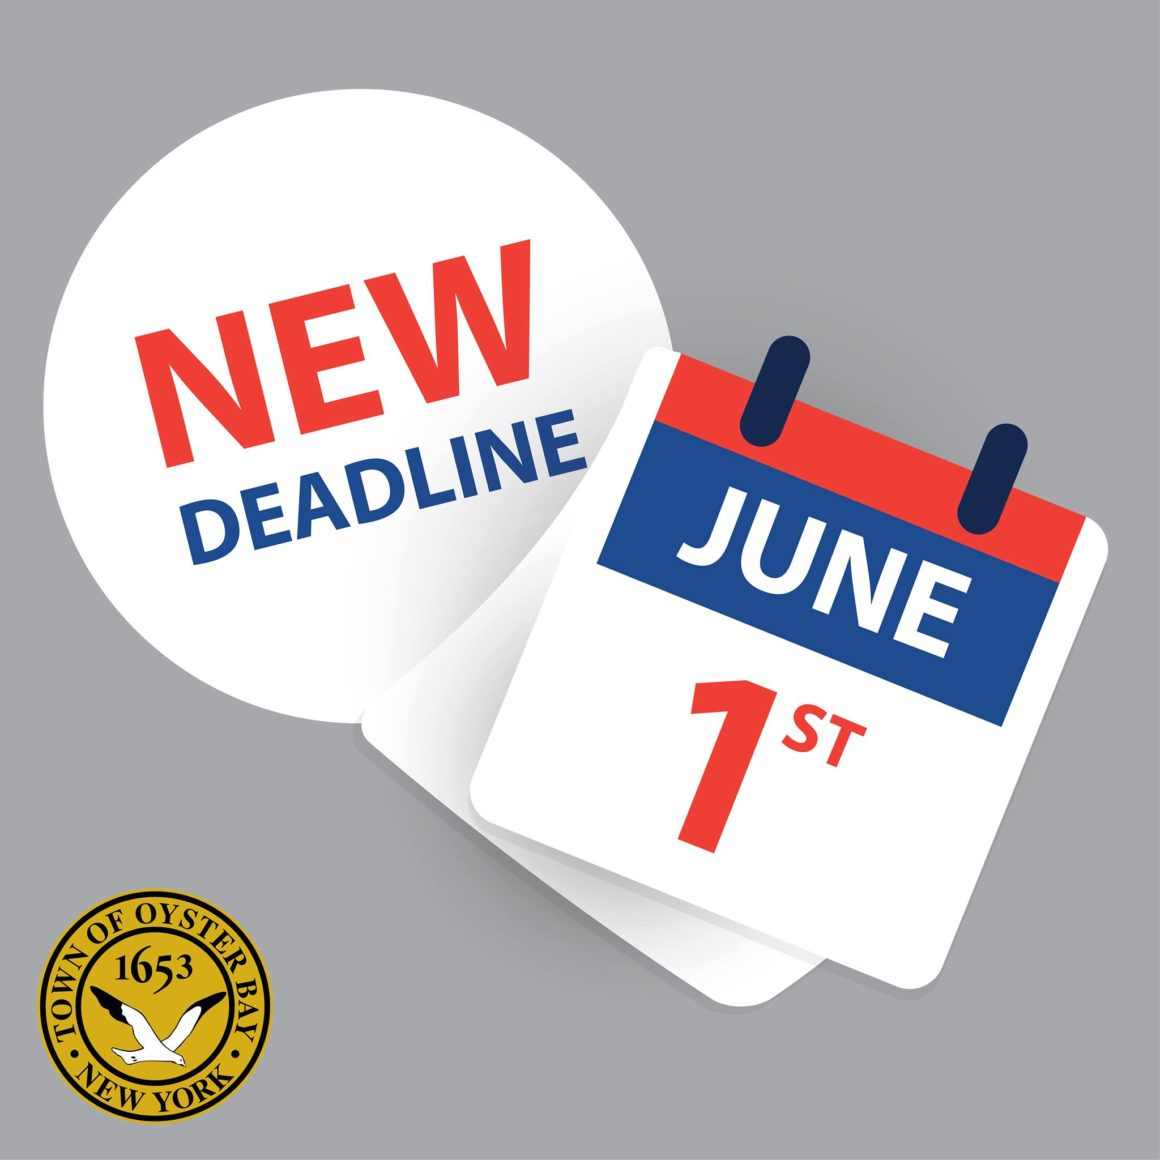 Pravato: School Property Tax Deadline Extended to June 1st